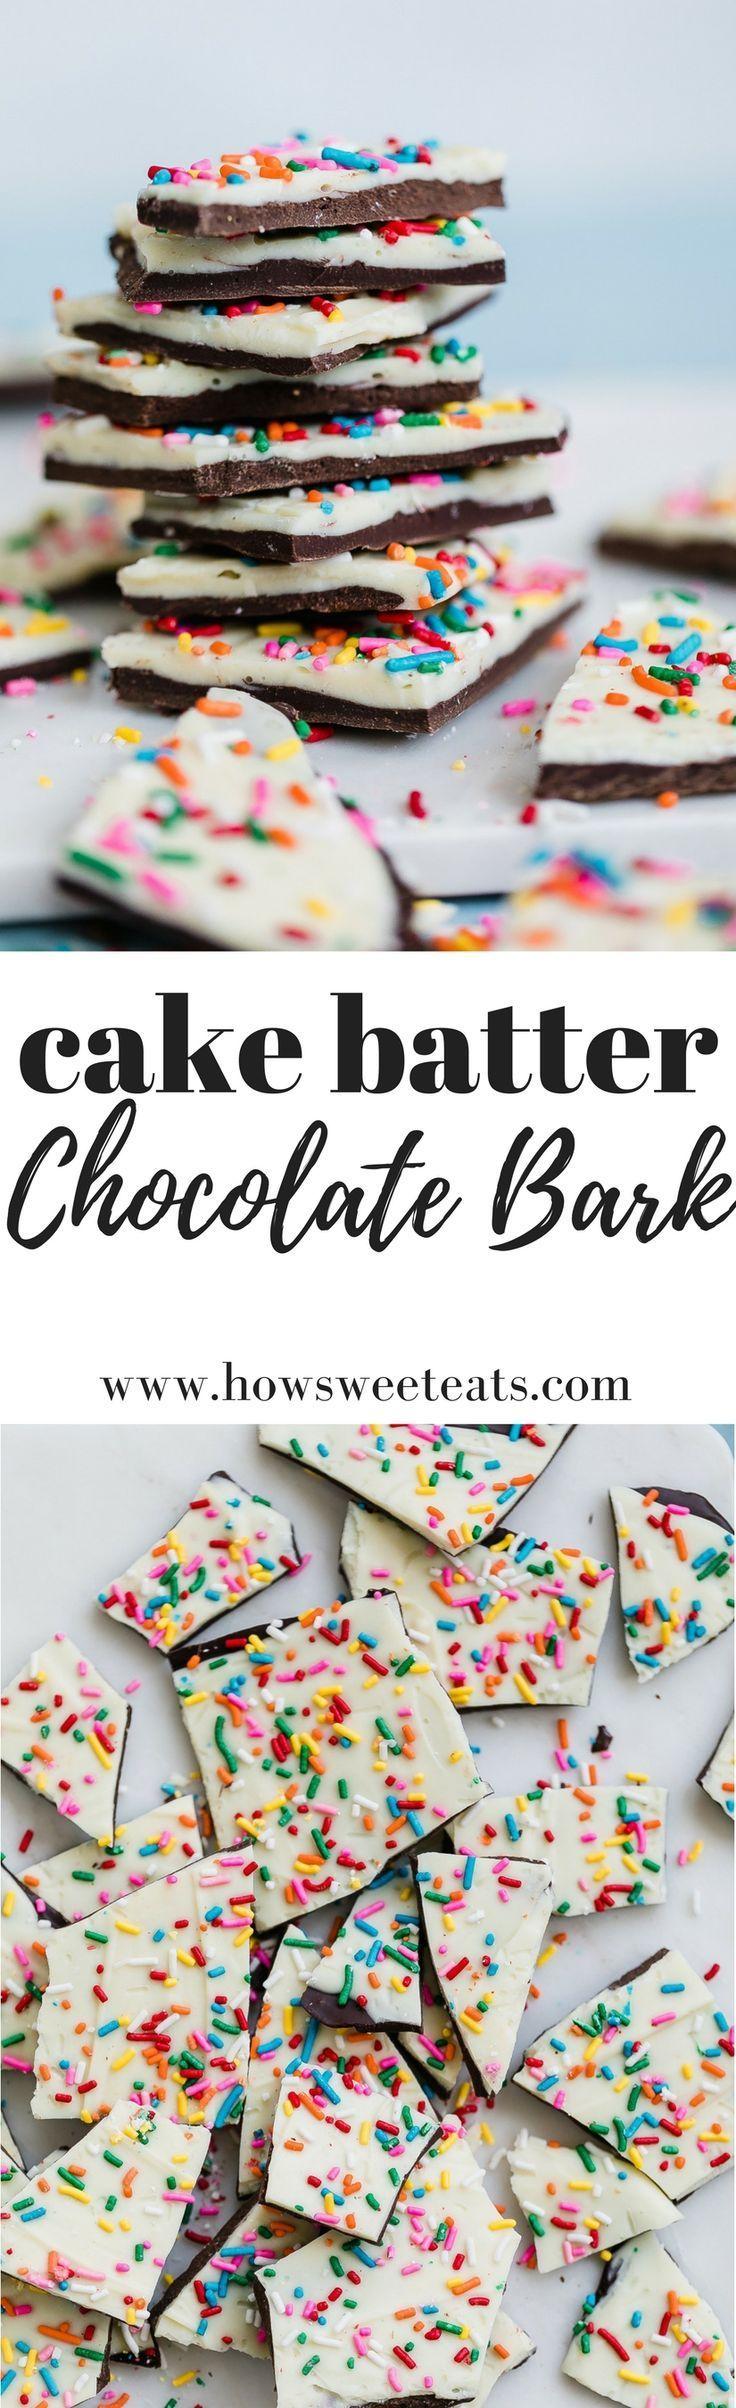 Cake Batter Chocolate Bark  | Posted By: DebbieNet.com